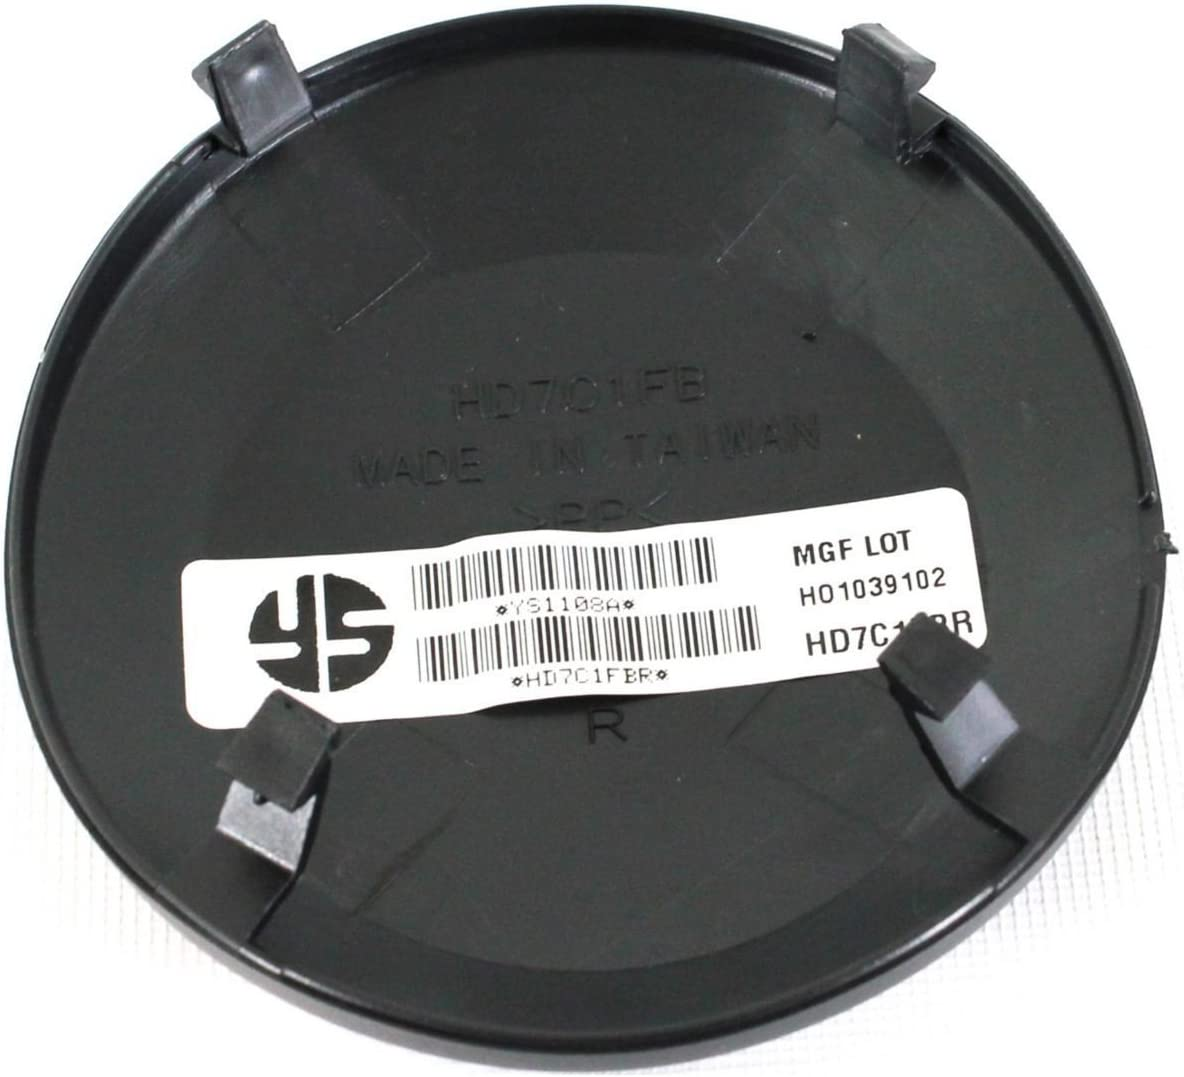 DAT Bumper Cover Cap Replacement for 09-11 Honda Pilot Black Front Right Passenger Side HO1039102